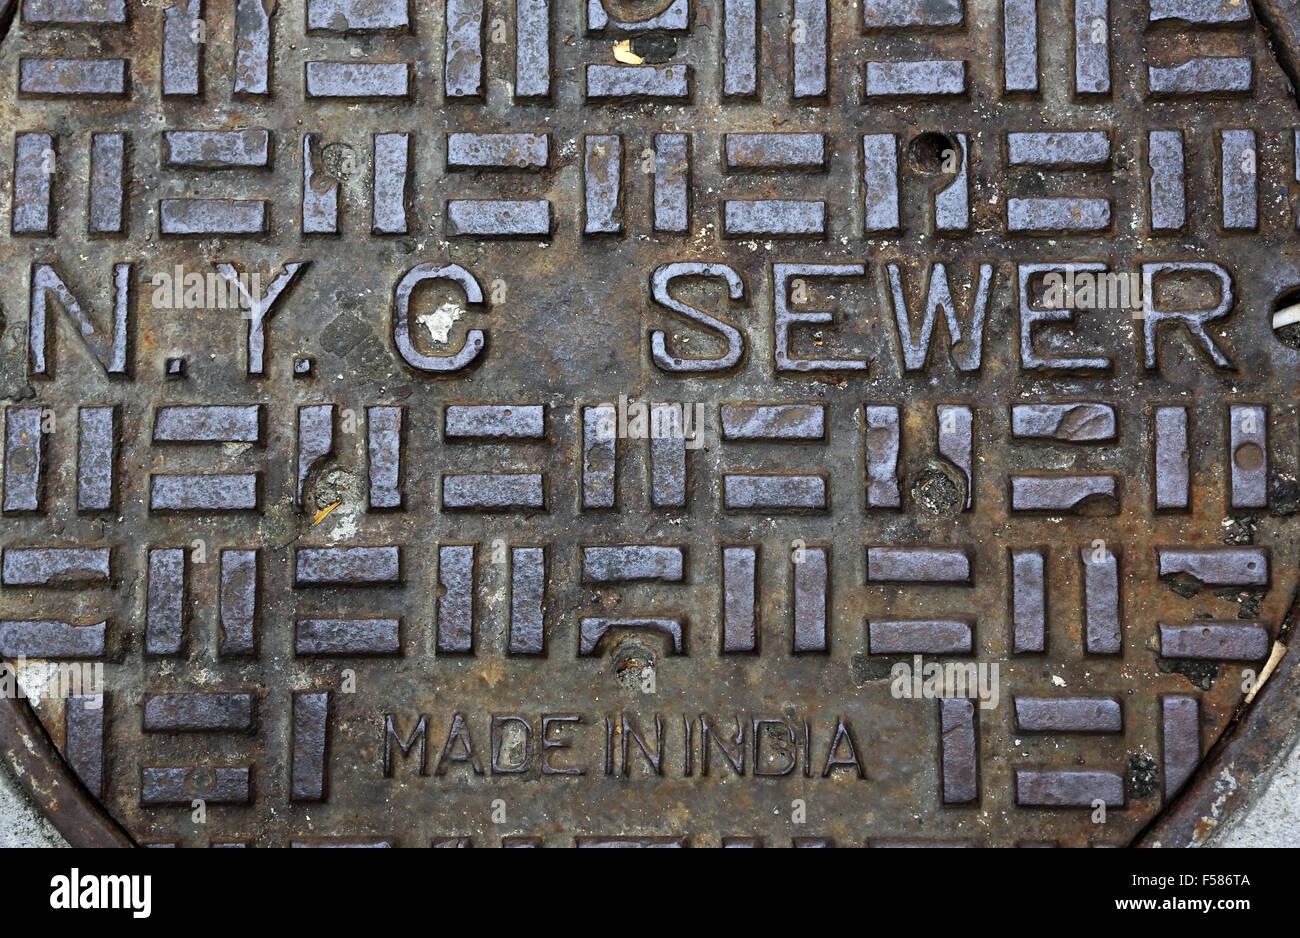 NYC New York City manhole cover made in India. Manhattan, New York City, USA - Stock Image